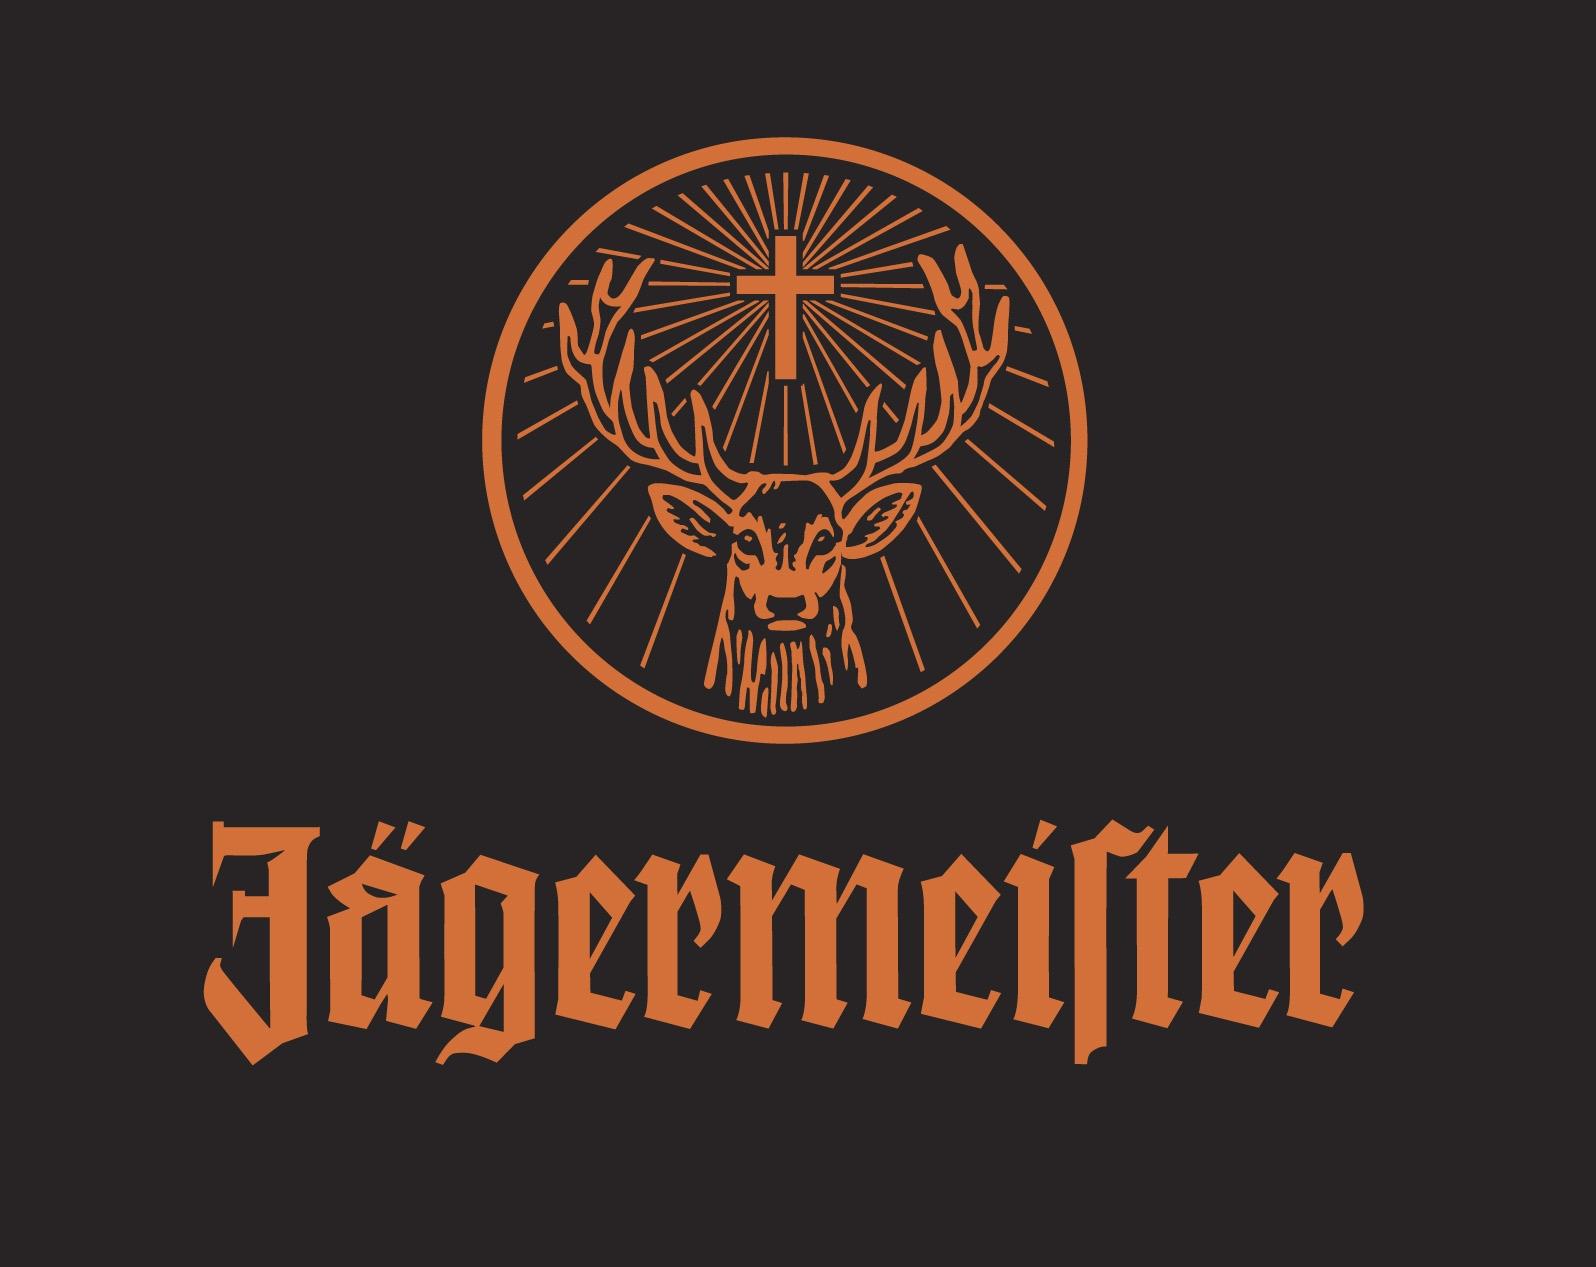 jagermeister_logo (1)